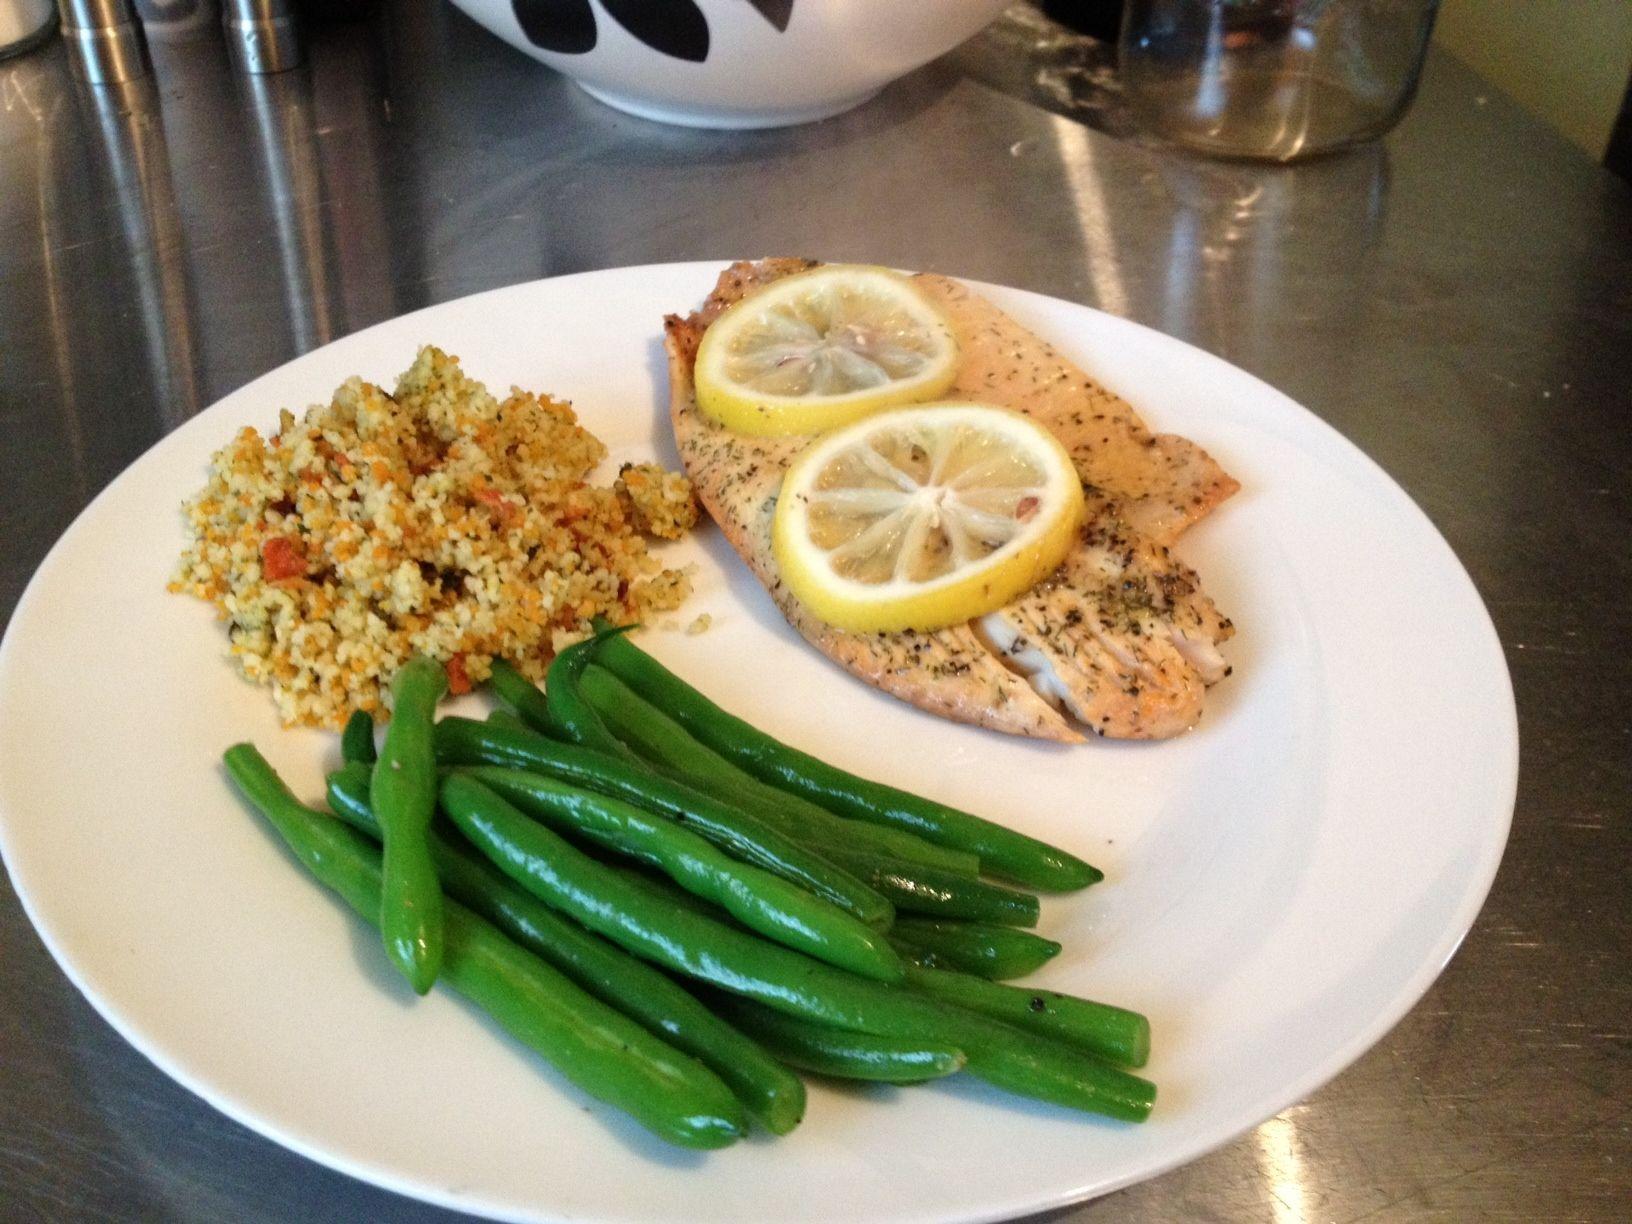 25 best lemon tilapia ideas on pinterest baked tilapia for Tilapia fish recipes baked